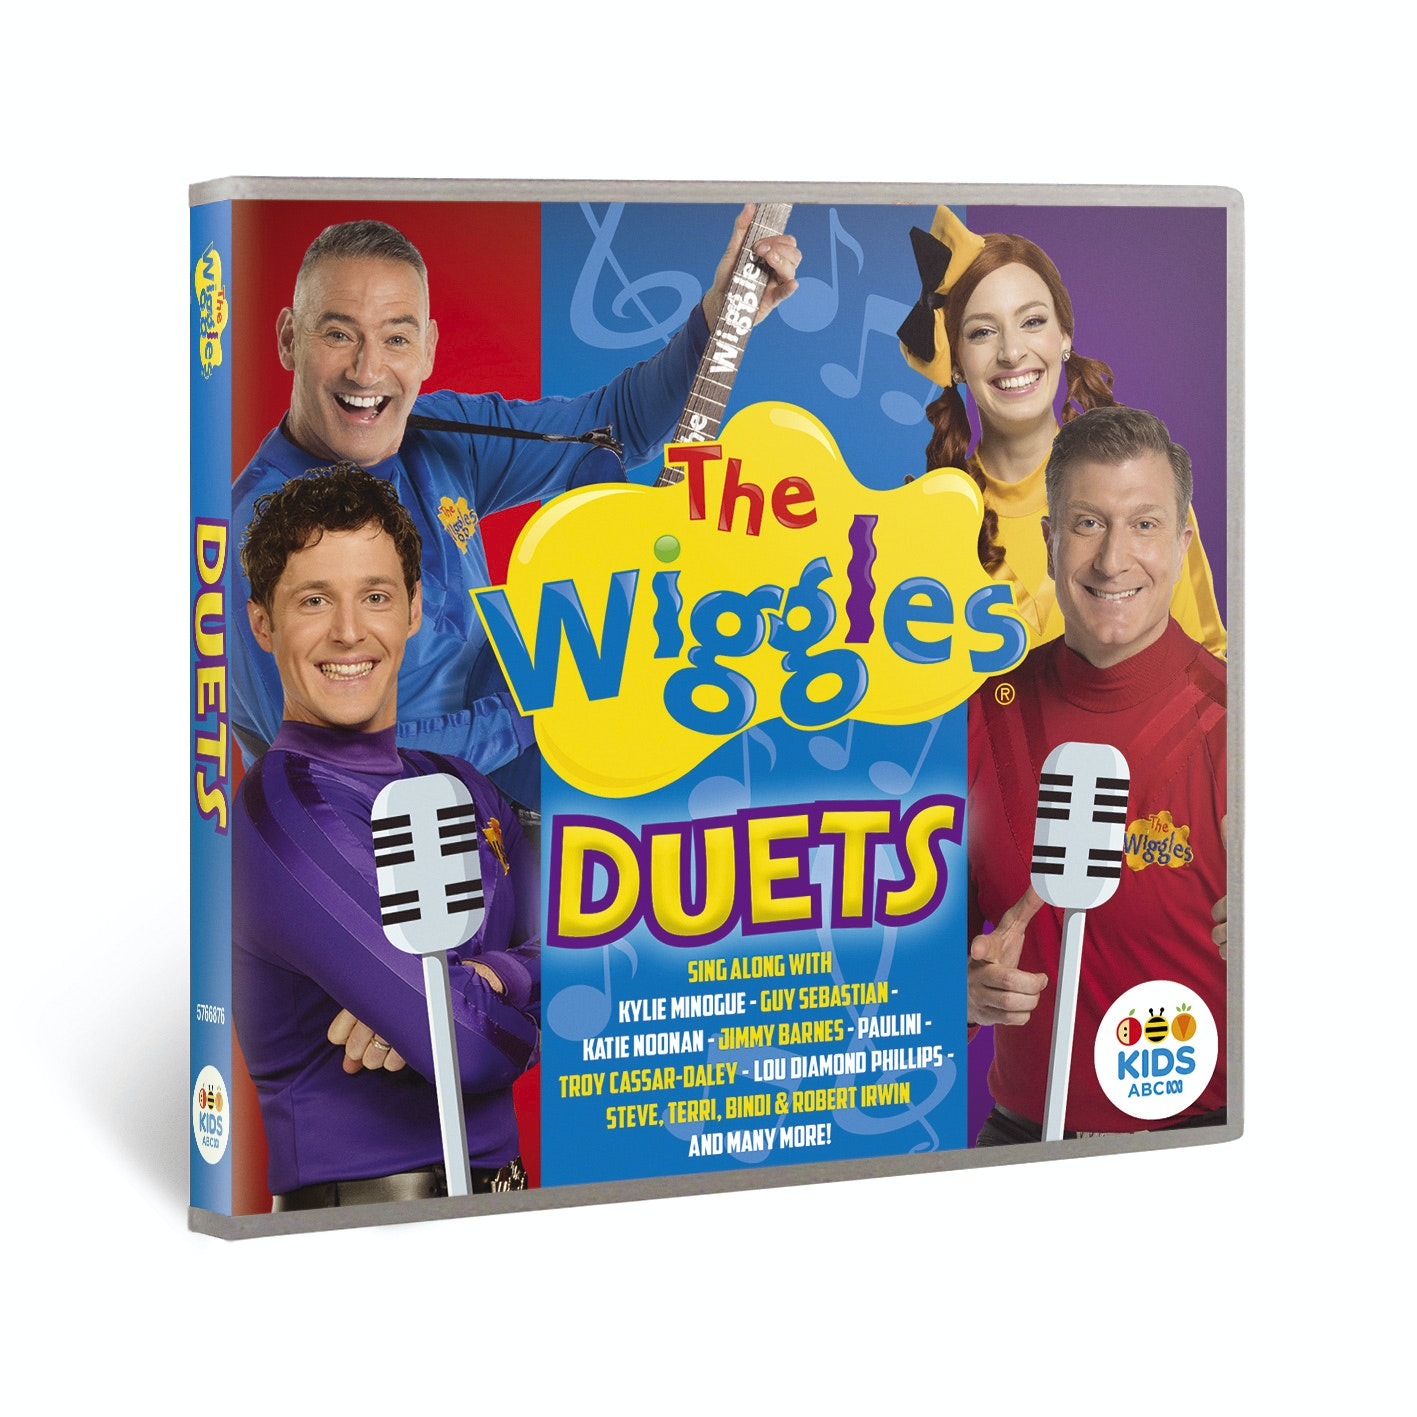 The wiggles   duets 3d packshot